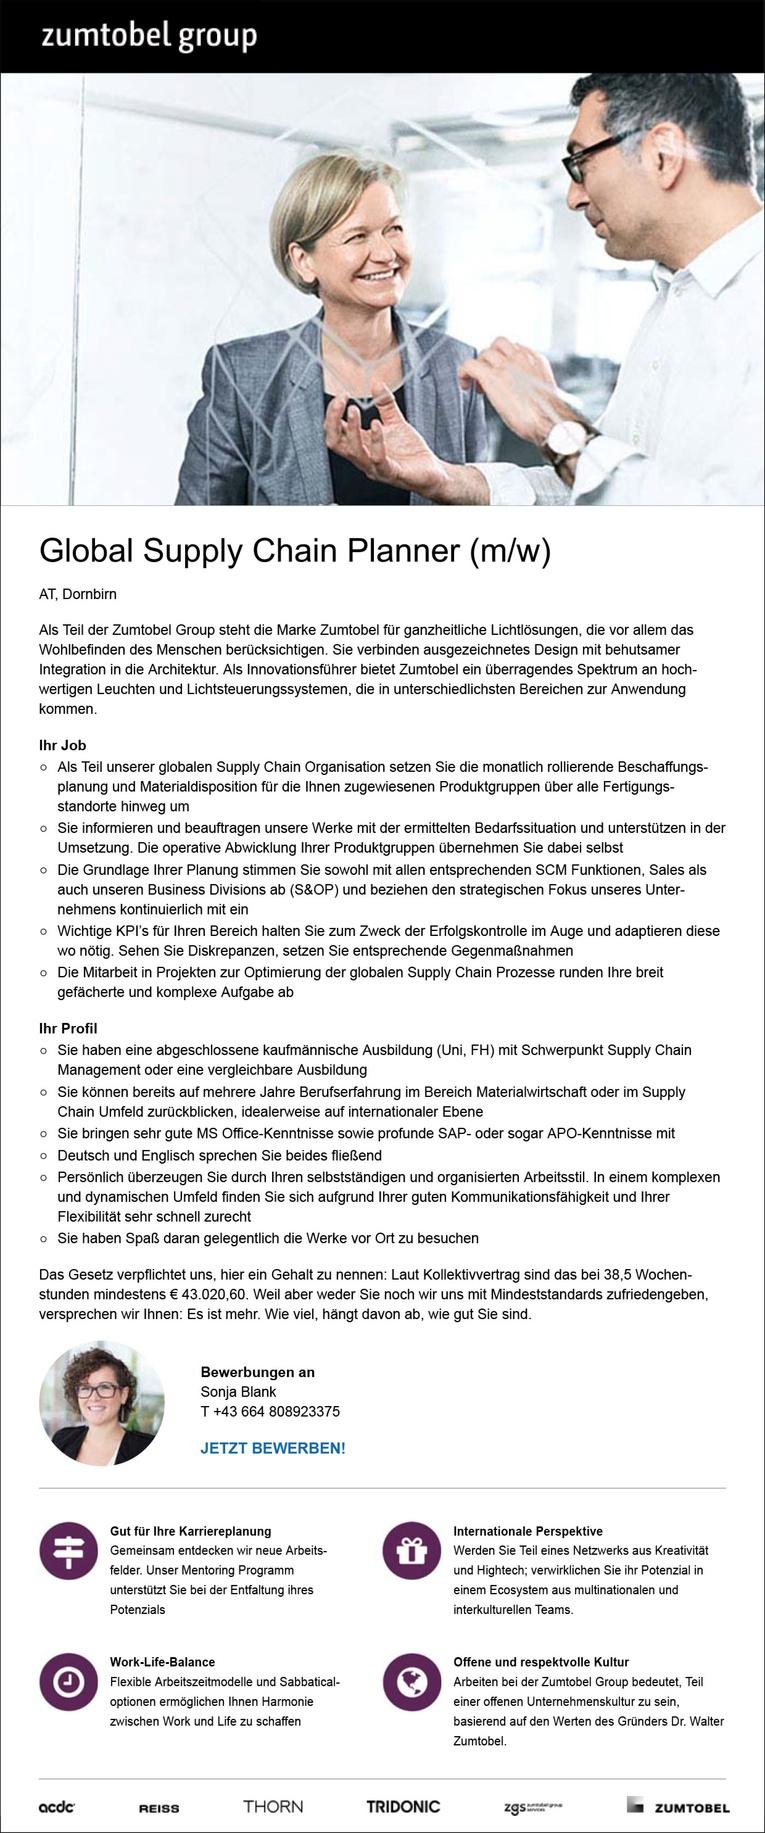 Global Supply Chain Planner (m/w) in Dornbirn